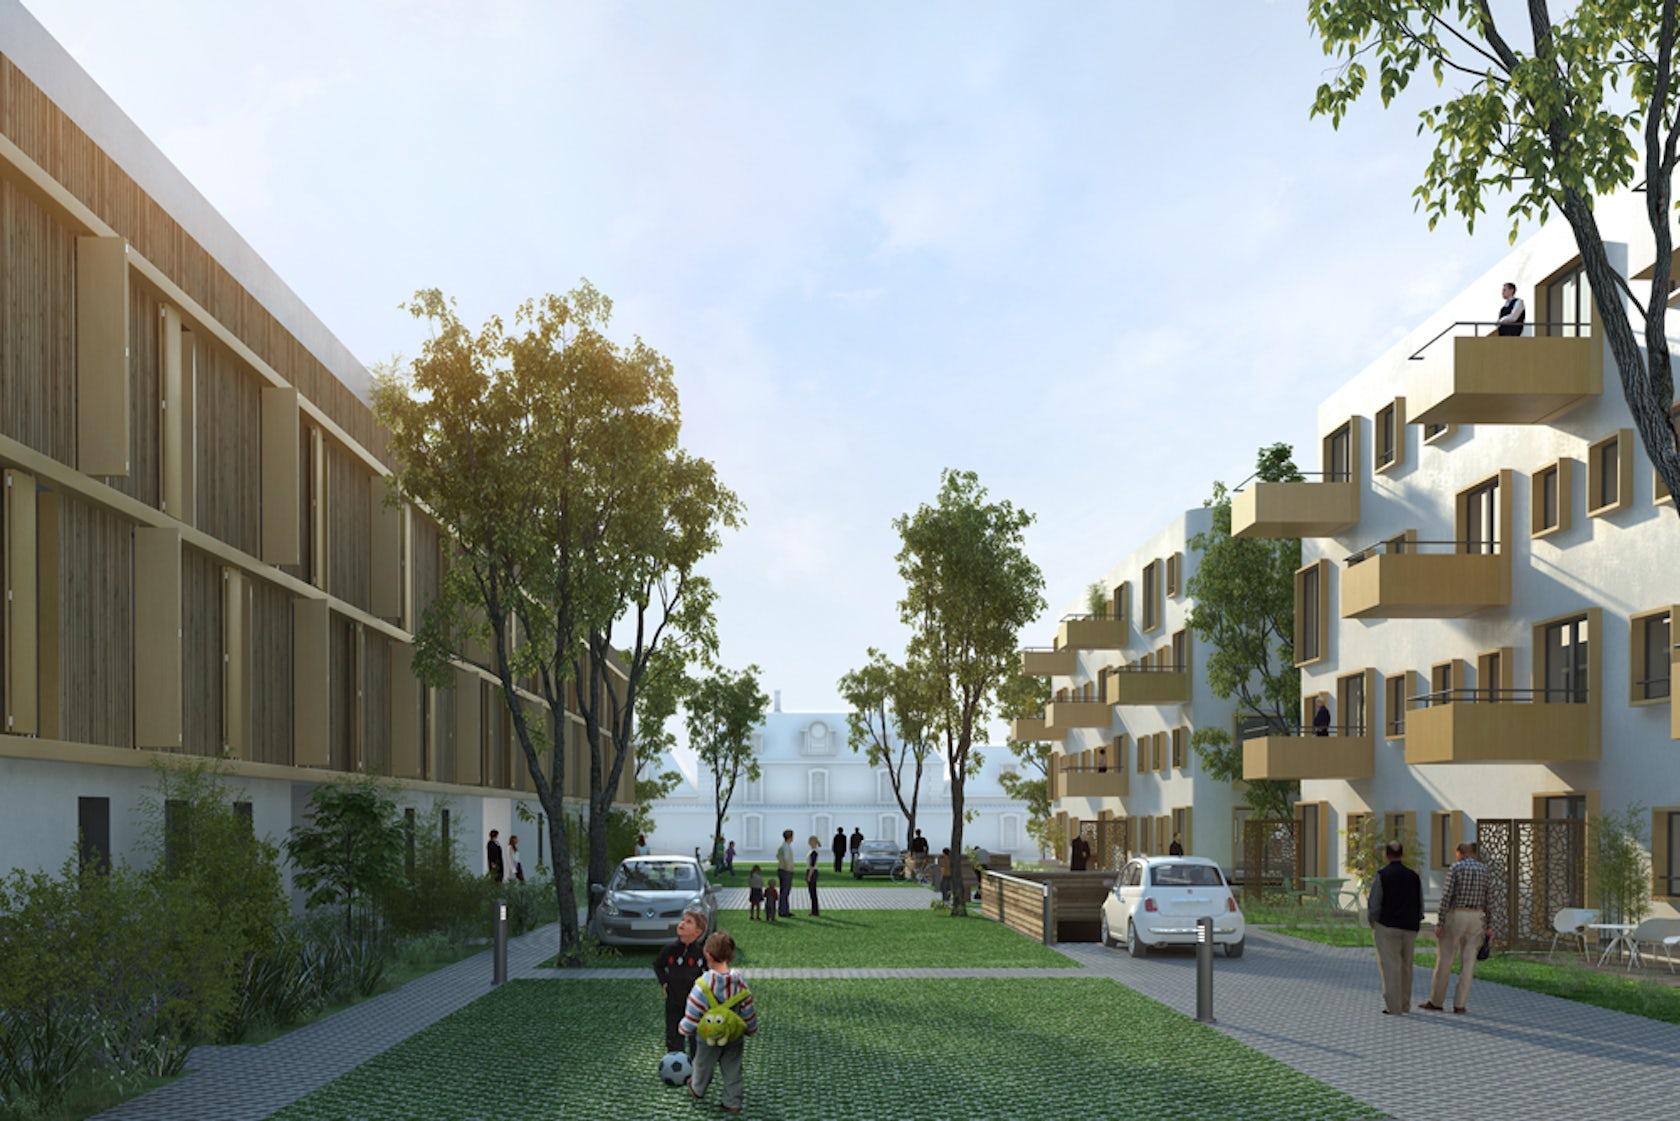 110 logements bourges architizer. Black Bedroom Furniture Sets. Home Design Ideas